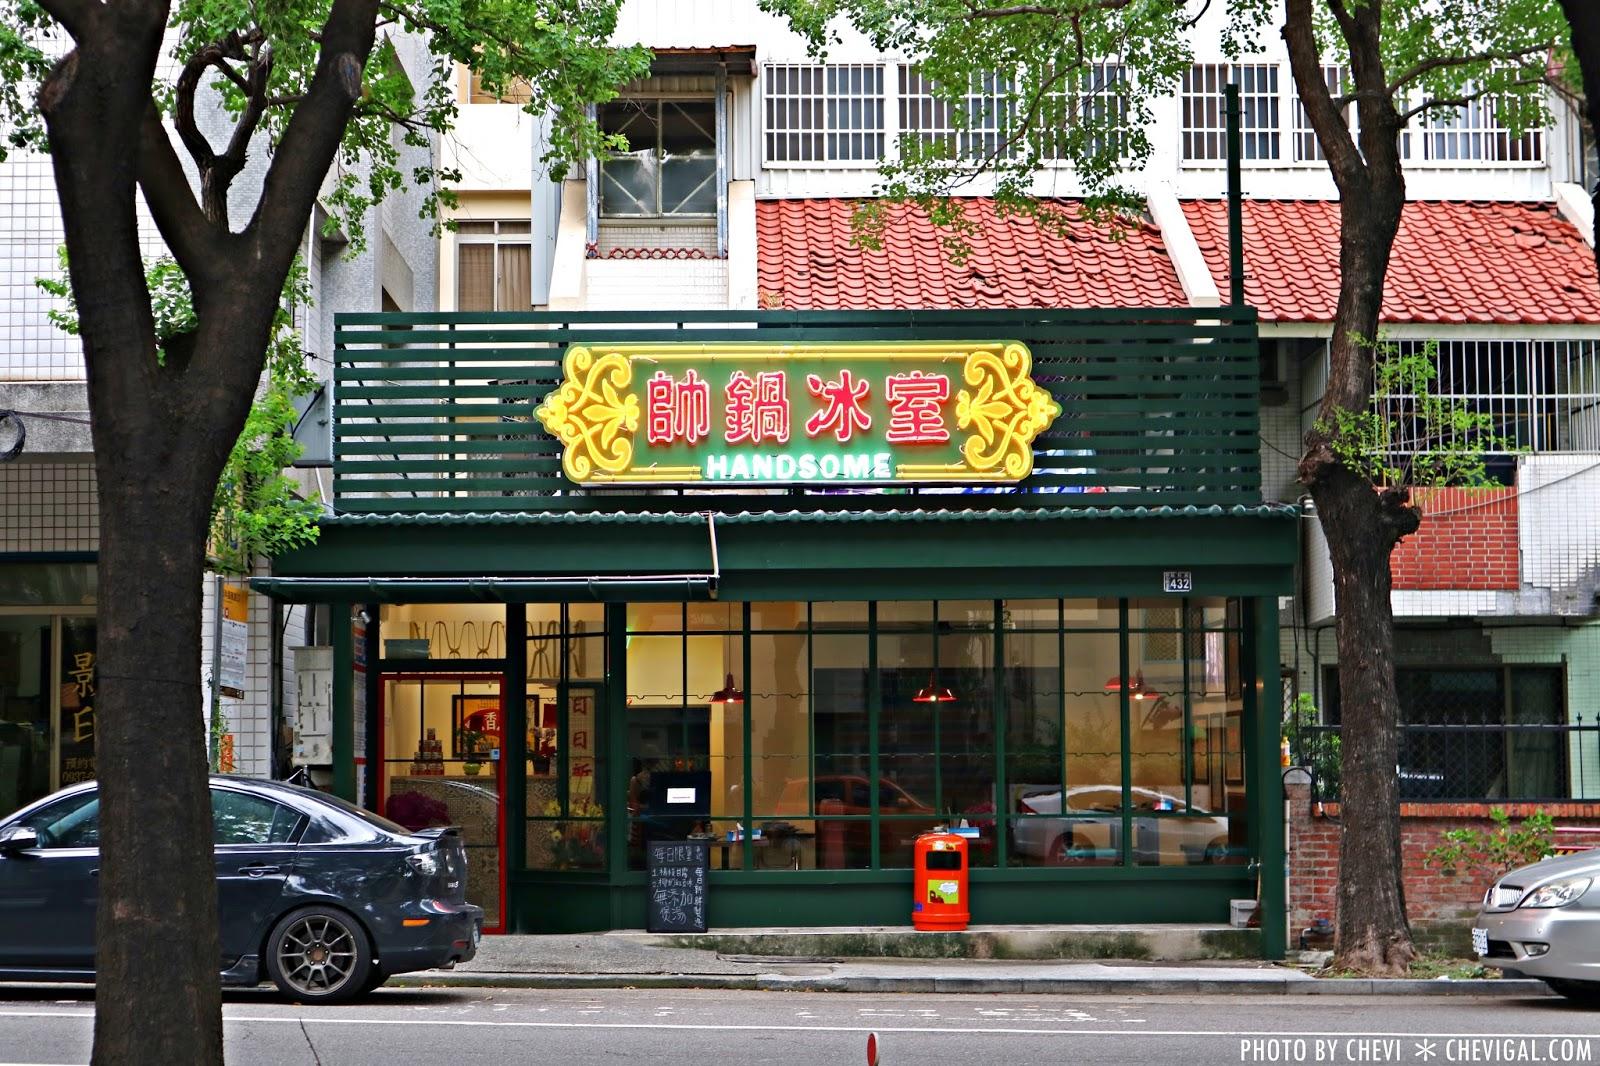 IMG 9122 - 台中西屯│帥鍋冰室*台中第一間香港冰室新開幕。道地港式餐點風味搬來台灣囉